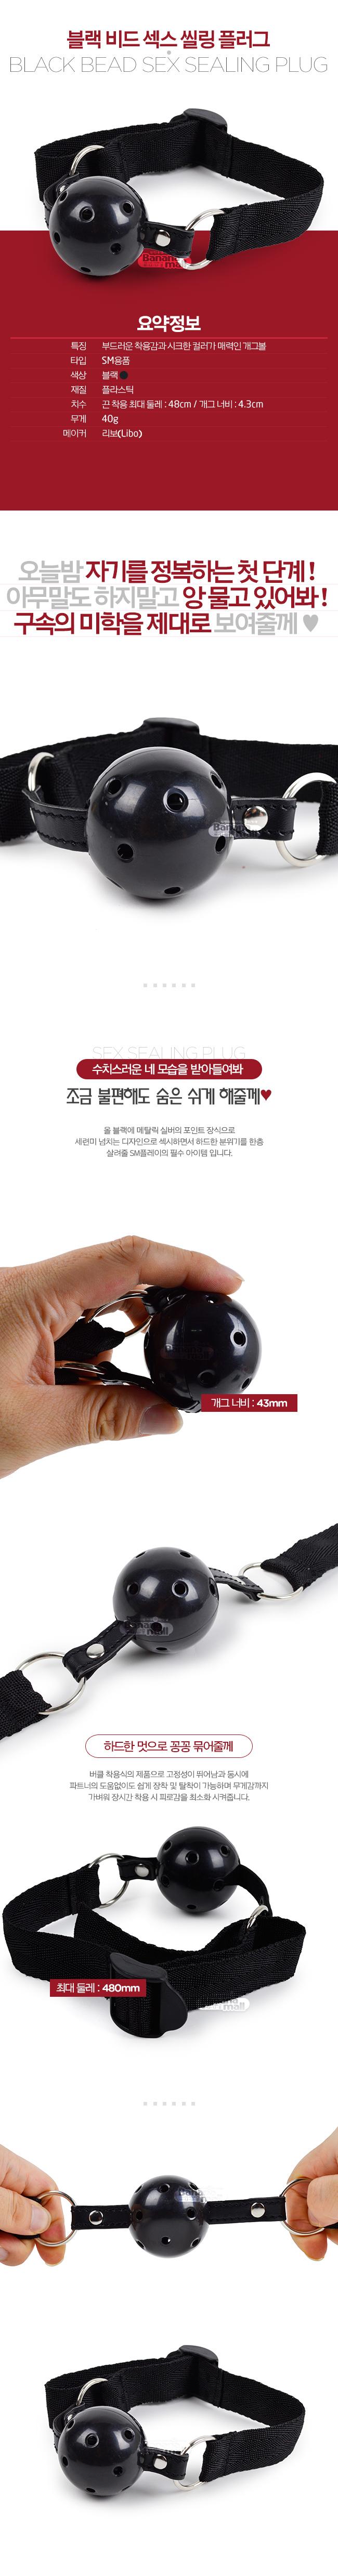 [SM용품] 블랙 비드 섹스 씰링 플러그(Black Bead Sex Sealing Plug) - 리보(LBS-6002-1) (LIBO)